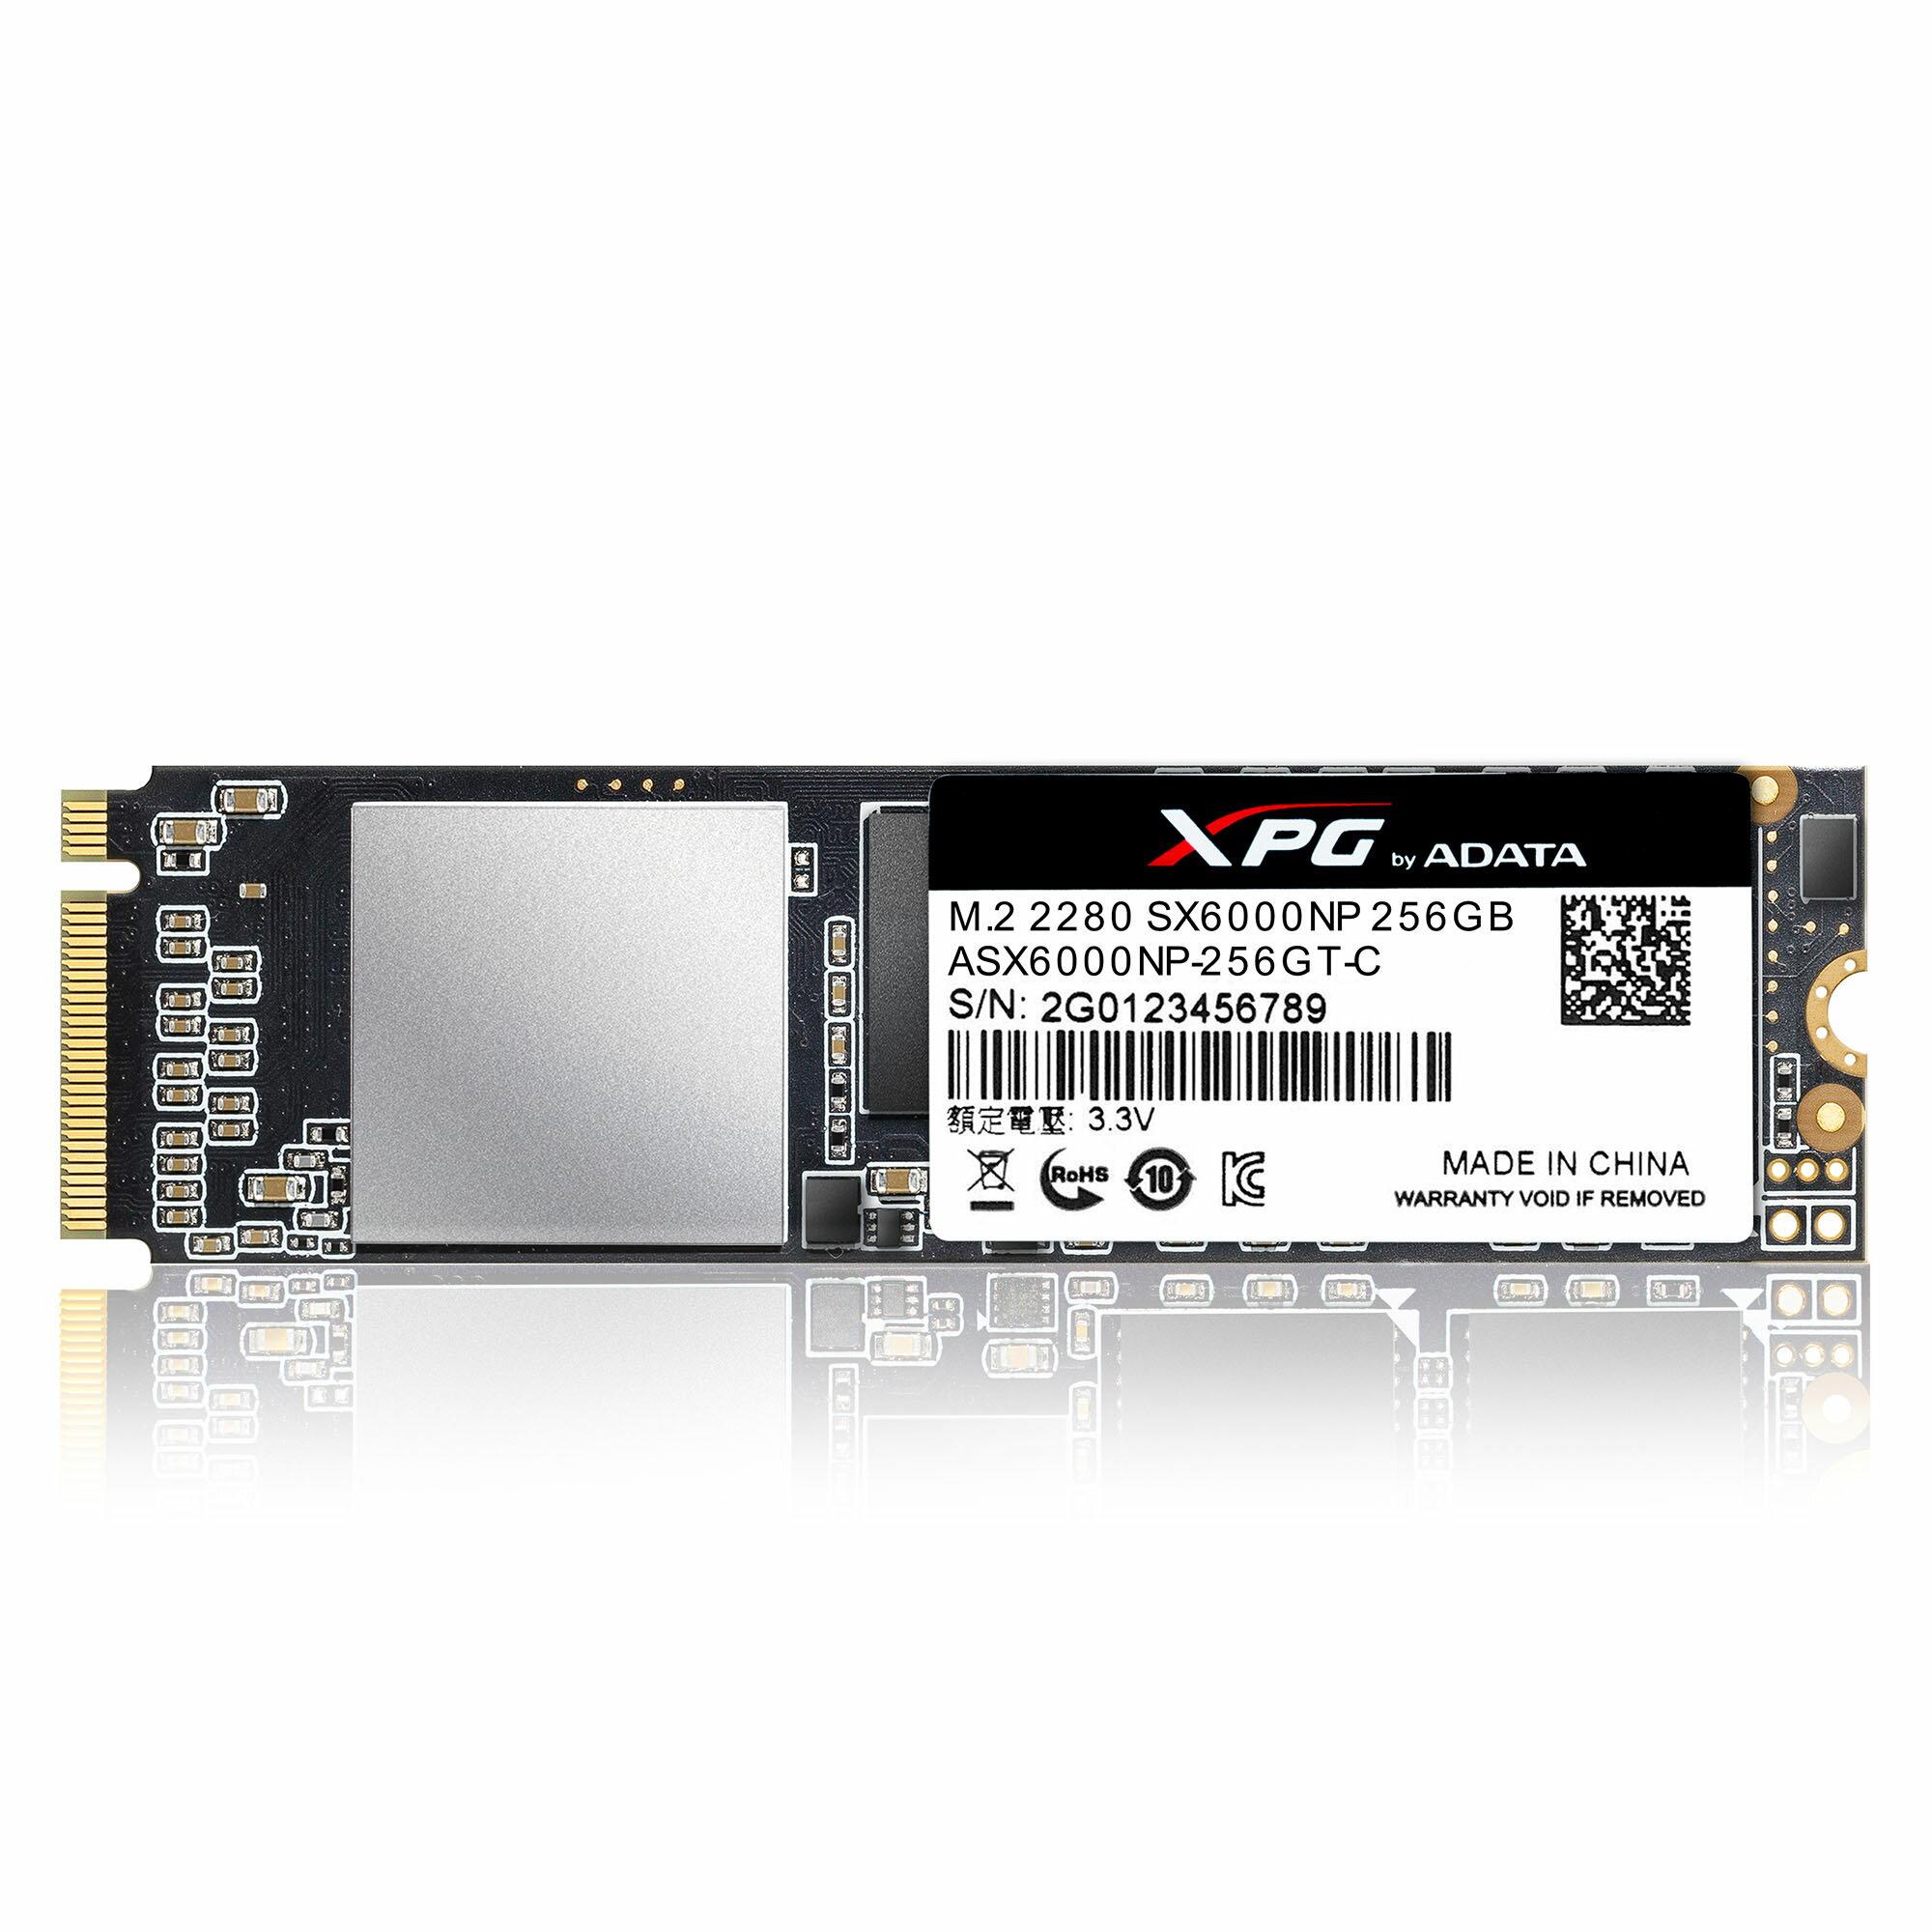 XPG SX6000 PCIe NMVe Gen3x2 M.2 2280 256GB SSD by ADATA with DIY XPG Heatsink 5